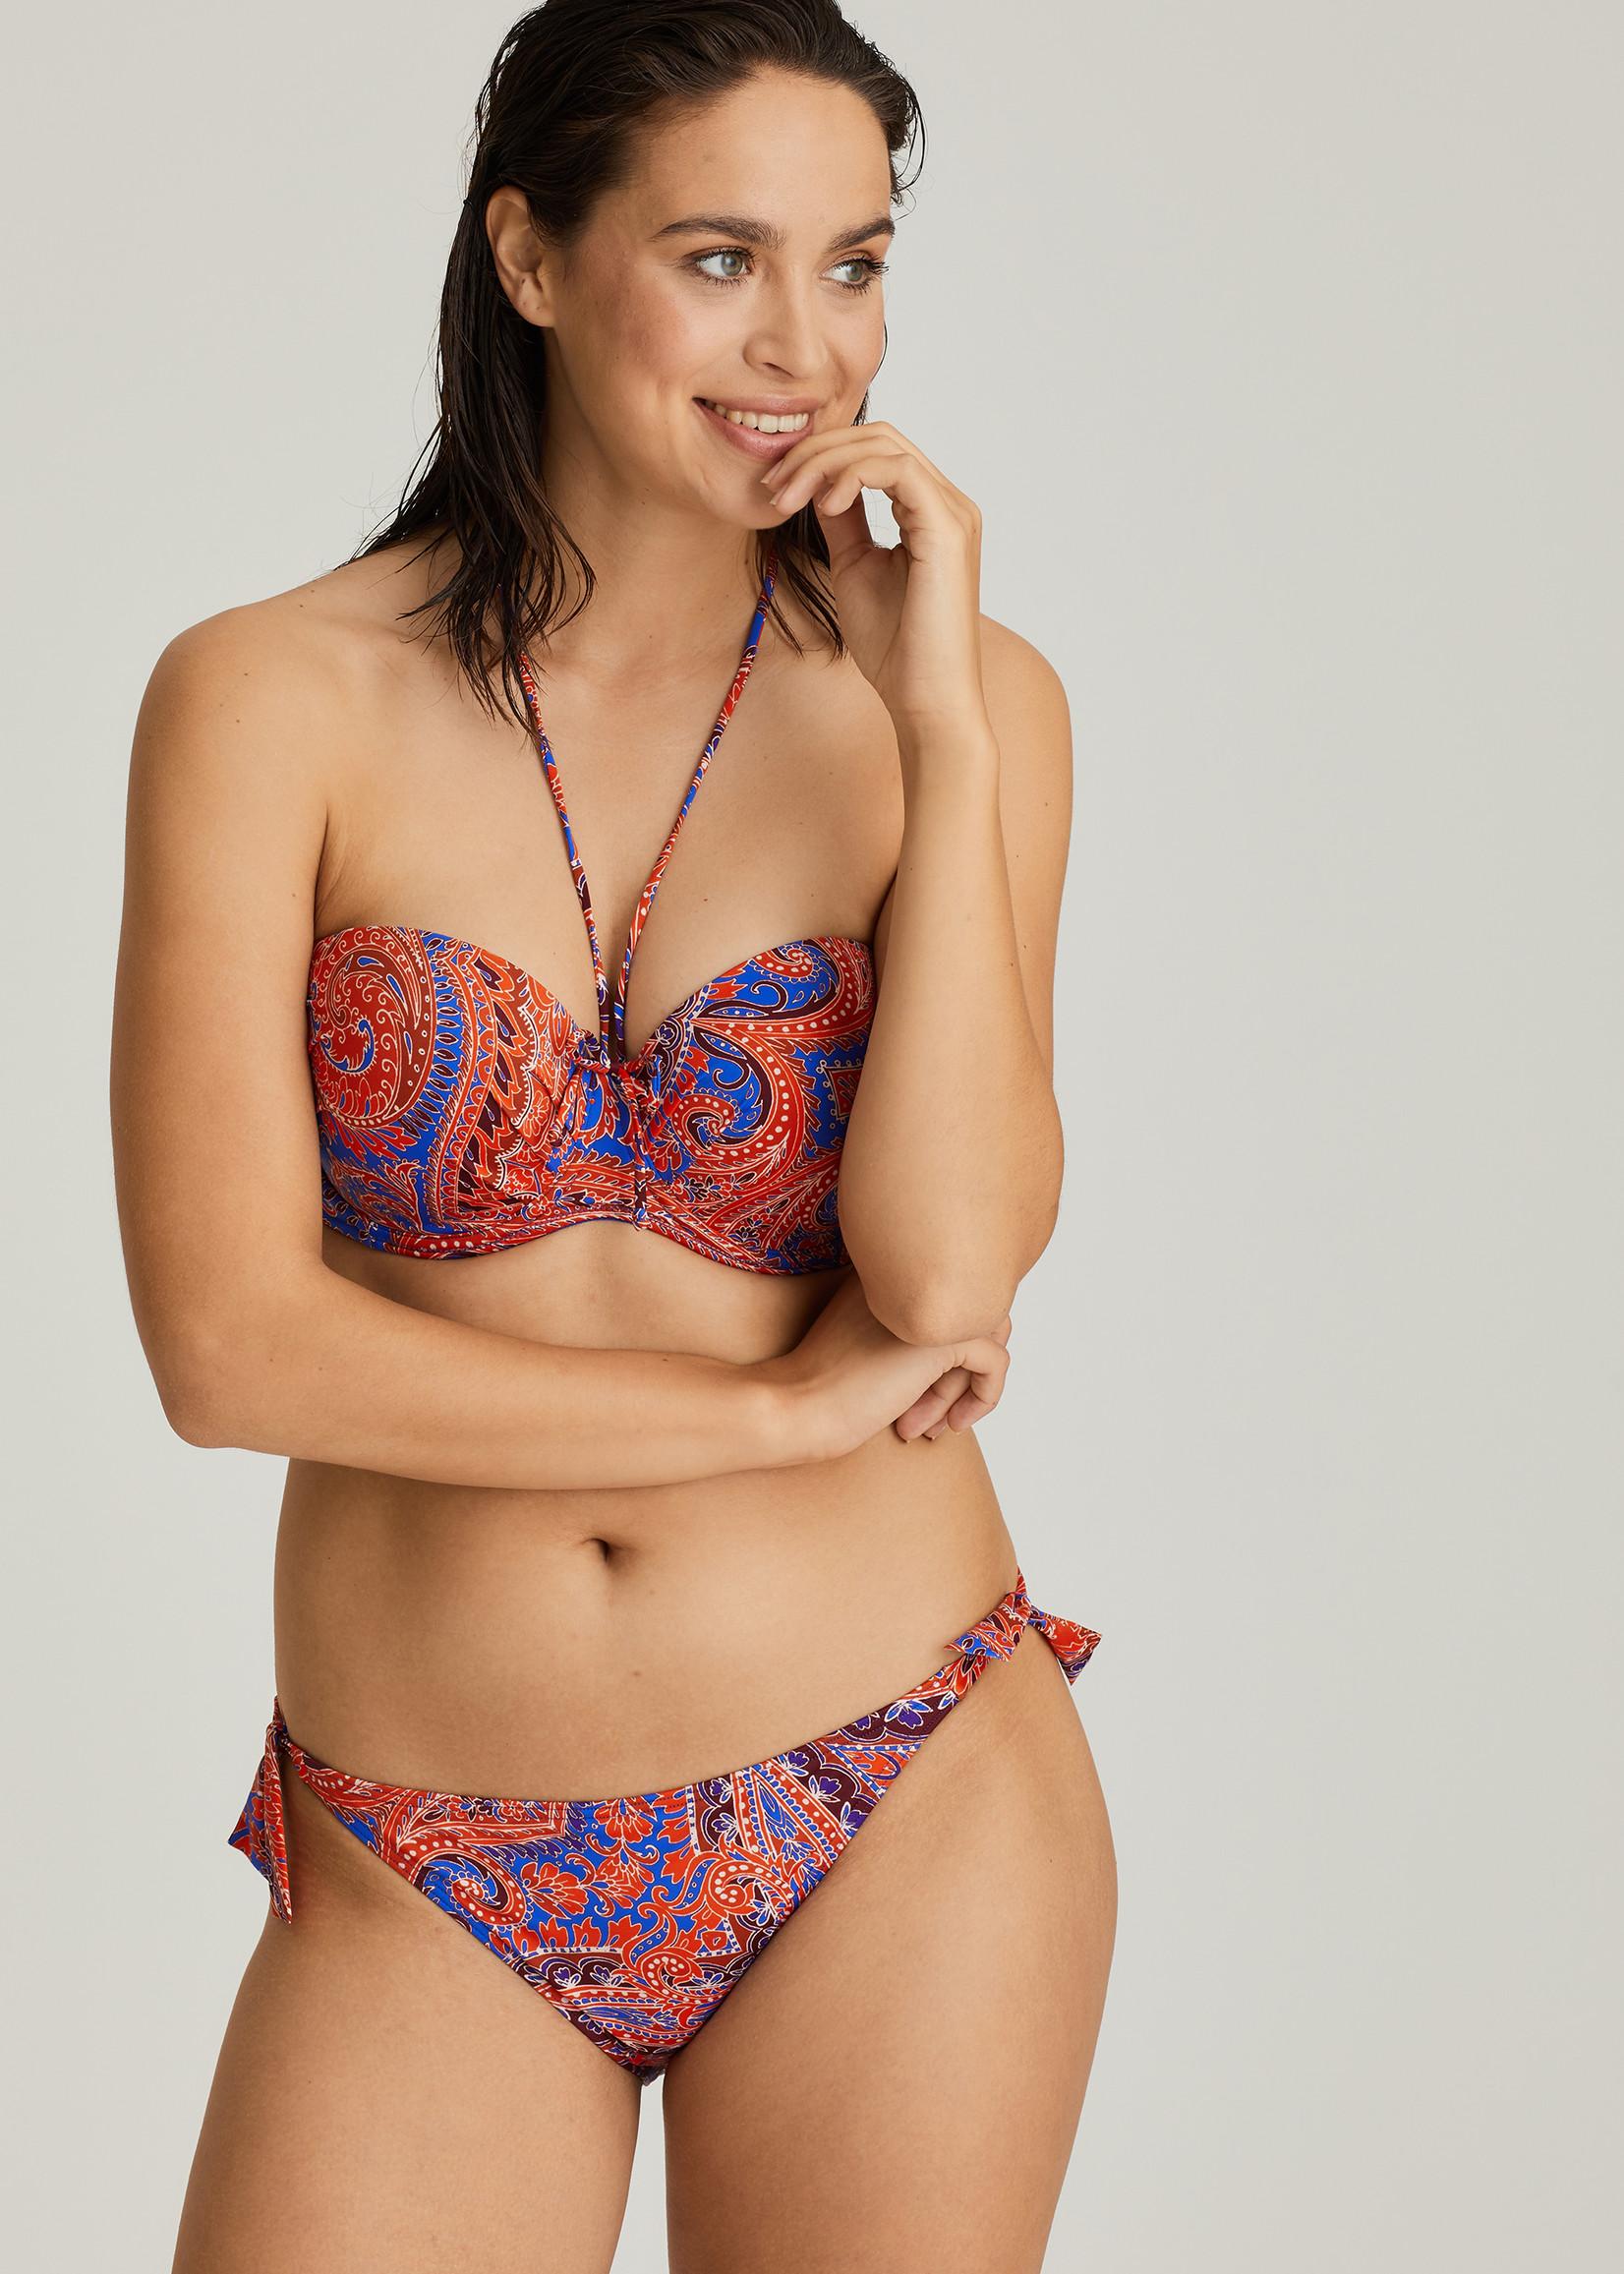 Prima Donna Casablanca Strapless Bikini